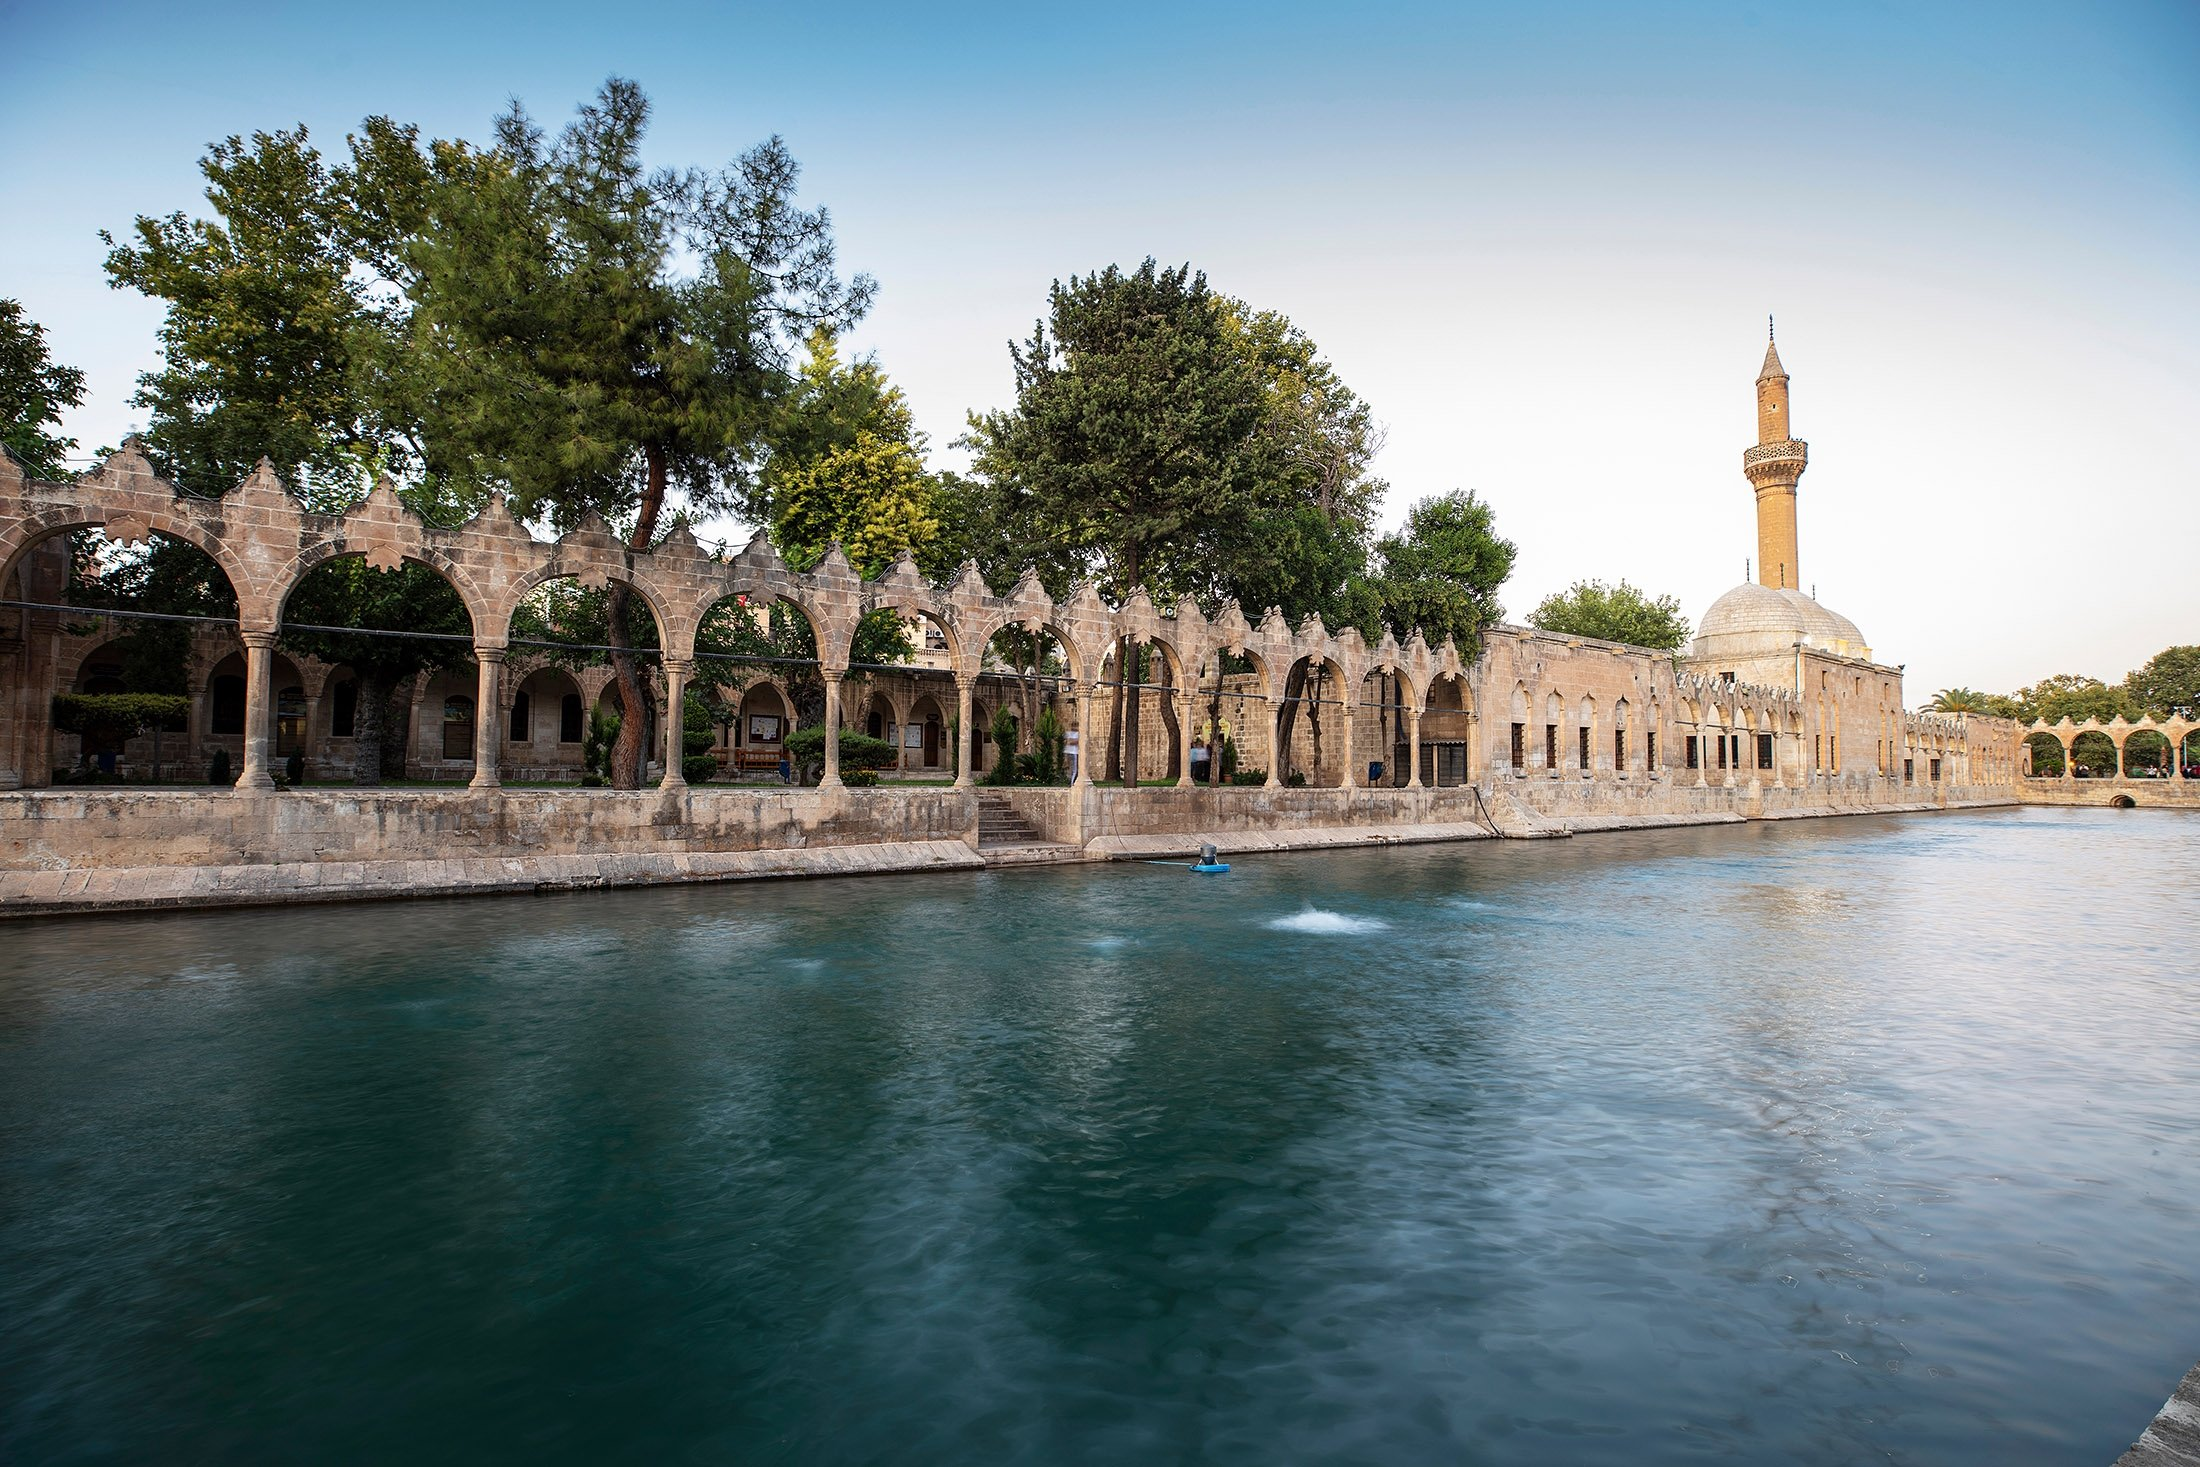 A view of Balıklıgöl (Fish Lake), Şanlıurfa, Turkey. (Shutterstock Photo)